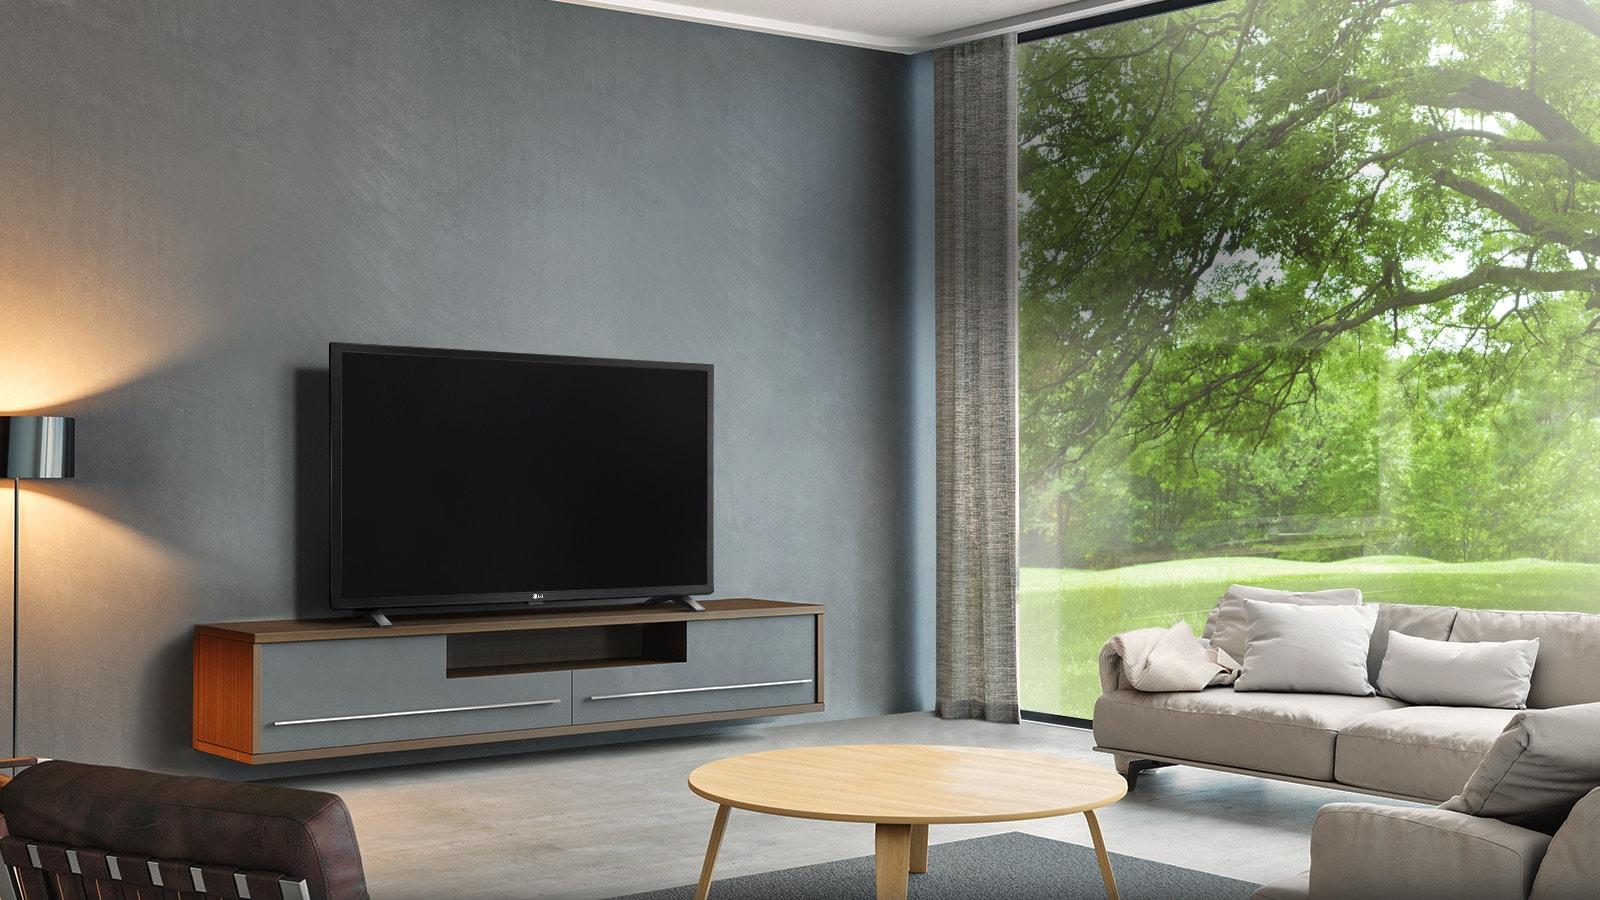 TV-FHD-32-LM63-09-Design-Desktop